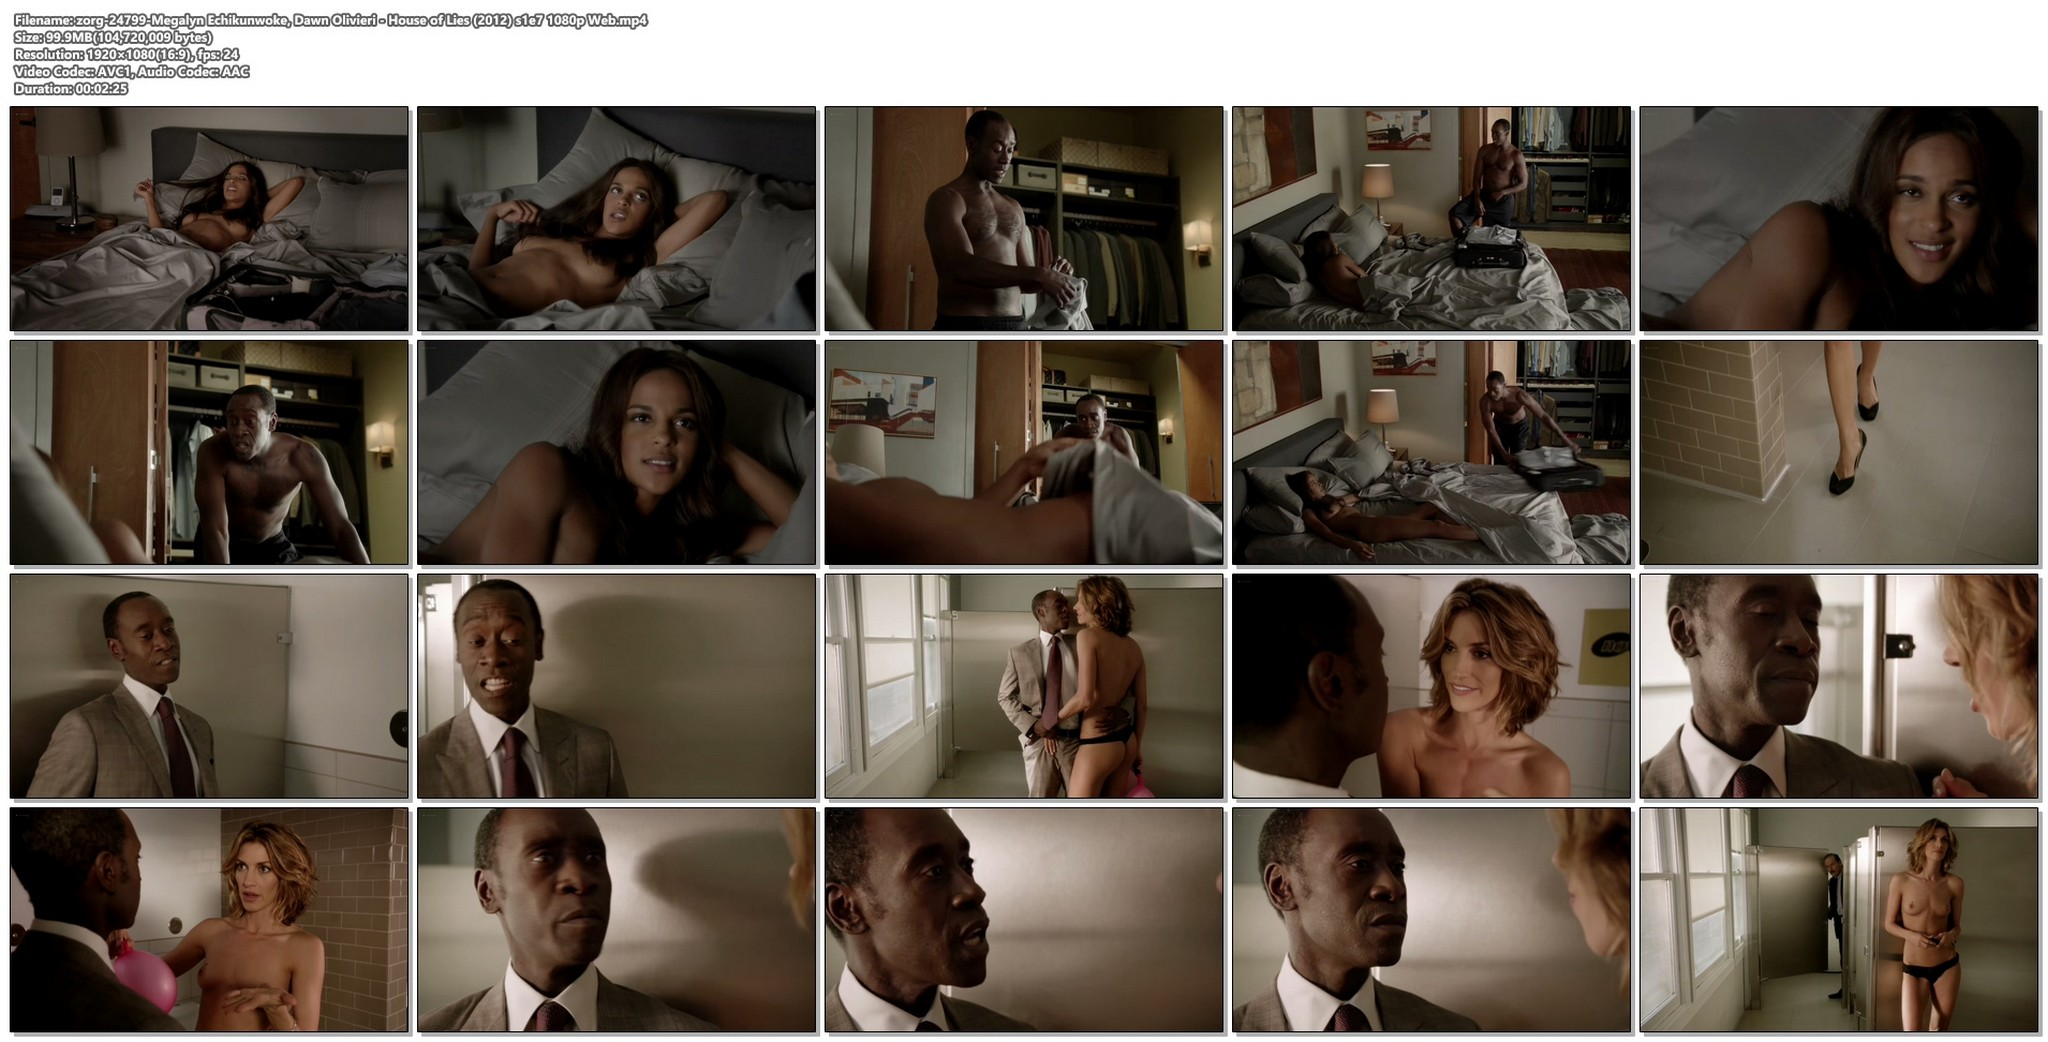 Megalyn Echikunwoke nude topless and Dawn Olivieri nude too House of Lies 2012 s1e7 1080p Web 11